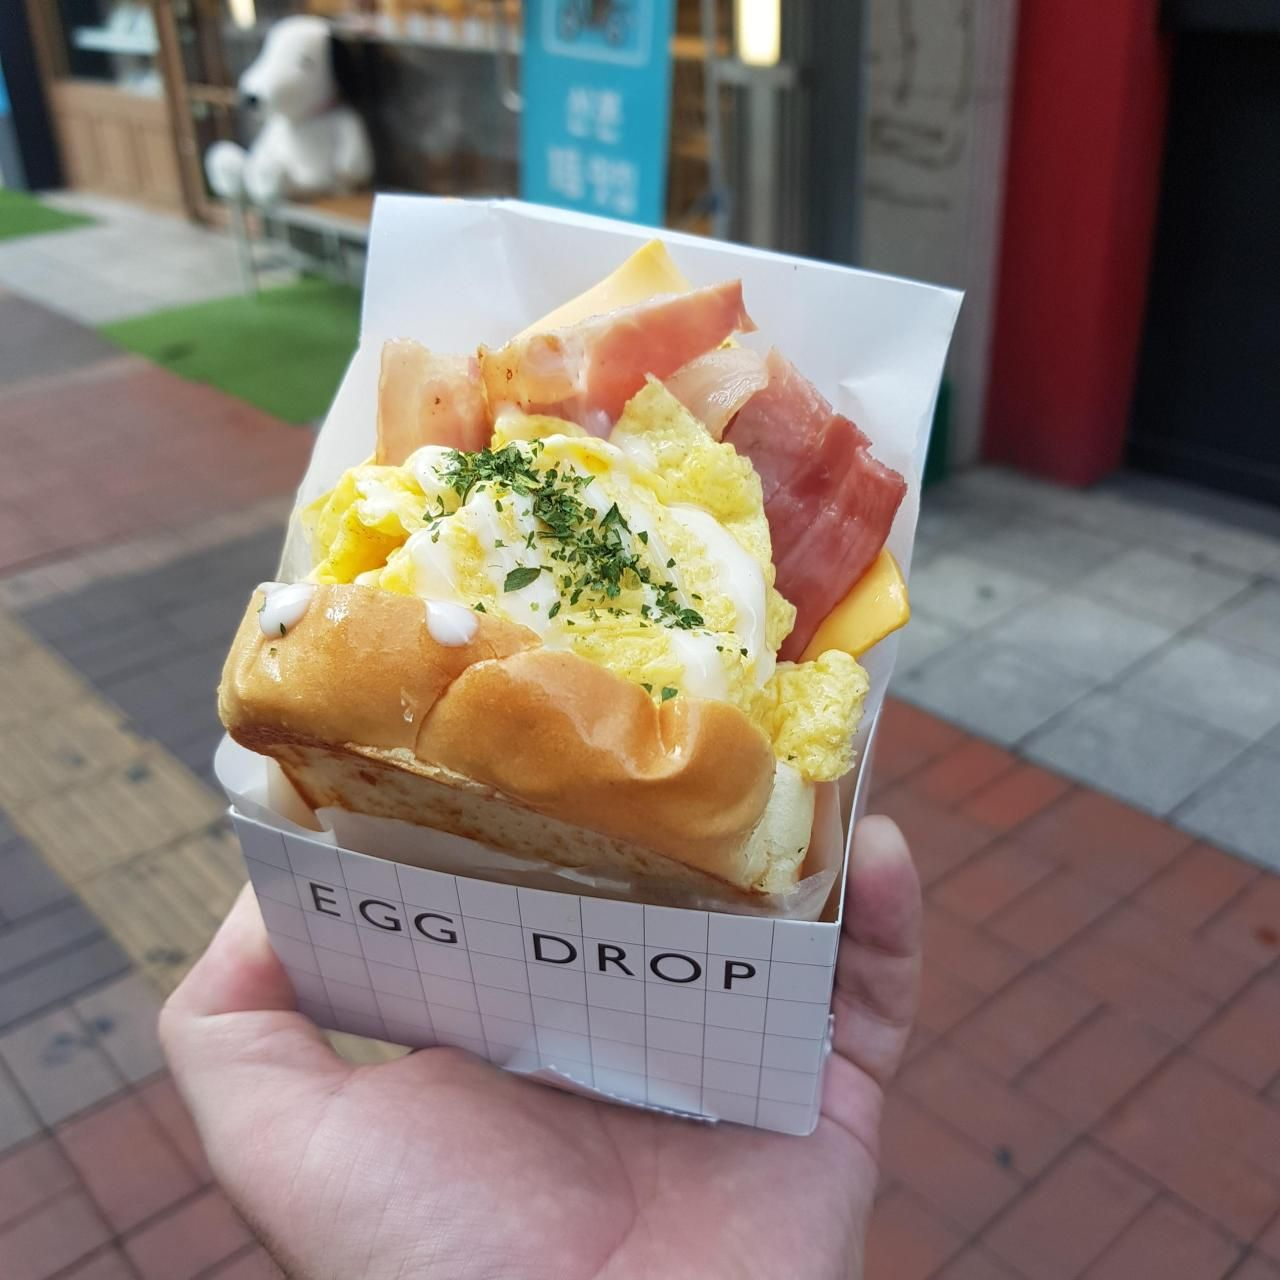 I Ate A Korean Premium Egg Sandwich Bacon Double Cheese Food Recipes Reddit Sandwich Summer Cafe Food Food Food Shop